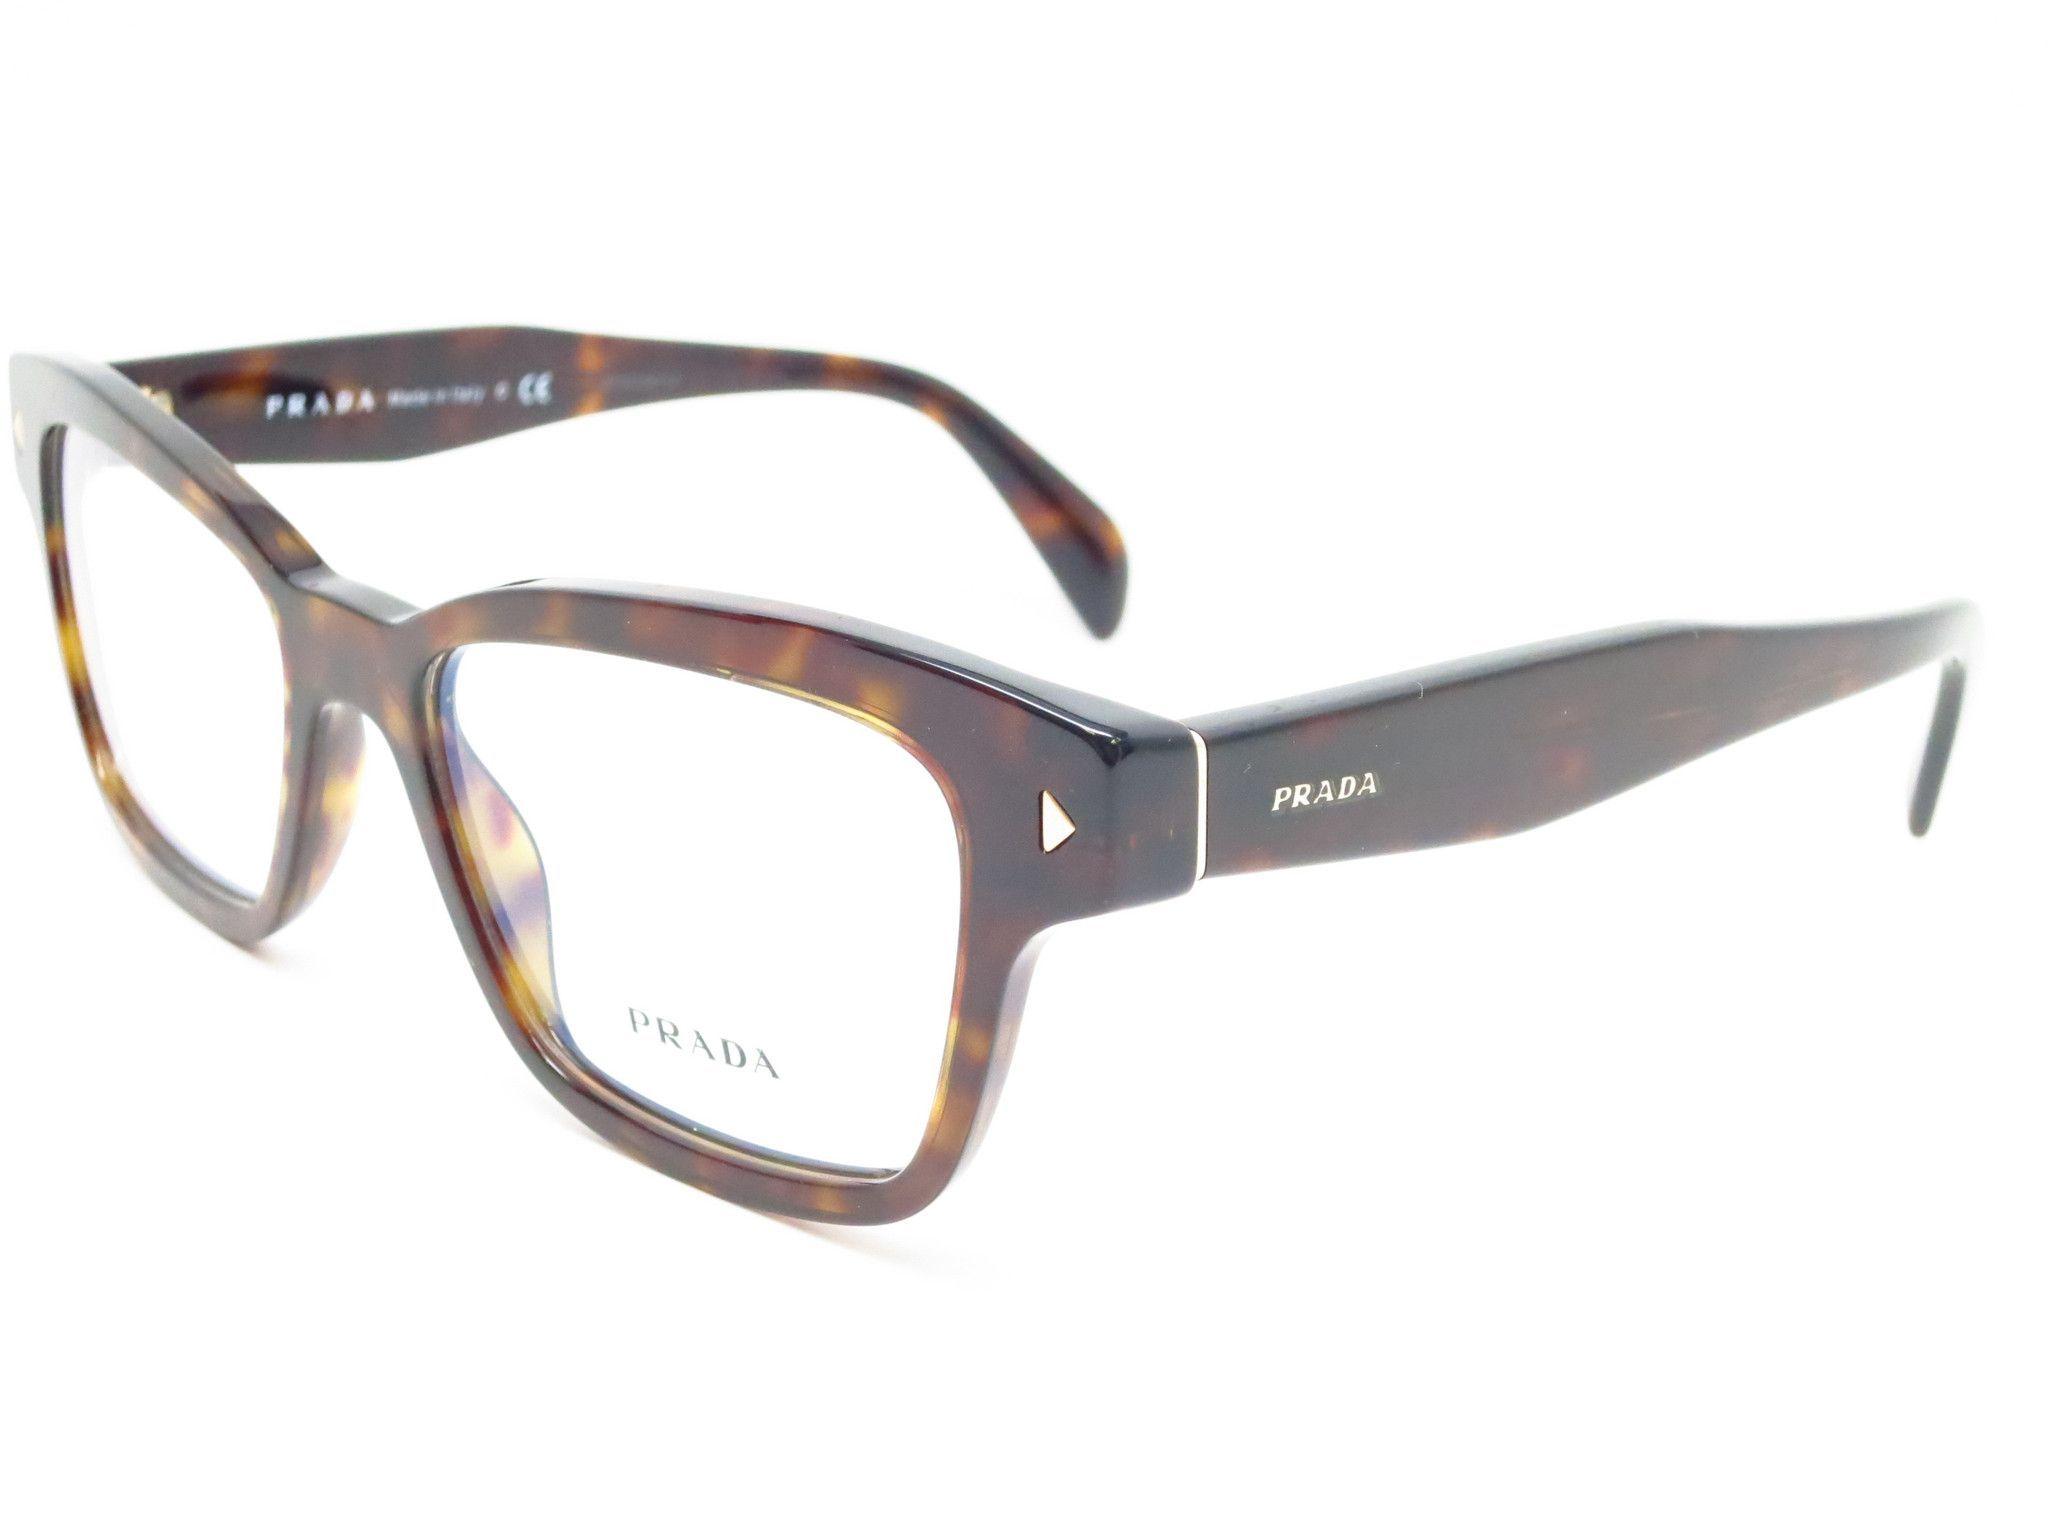 7c9b9036d7fb Prada VPR 10S Product Details Brand Name   Prada Model Number   VPR 10S -  Color